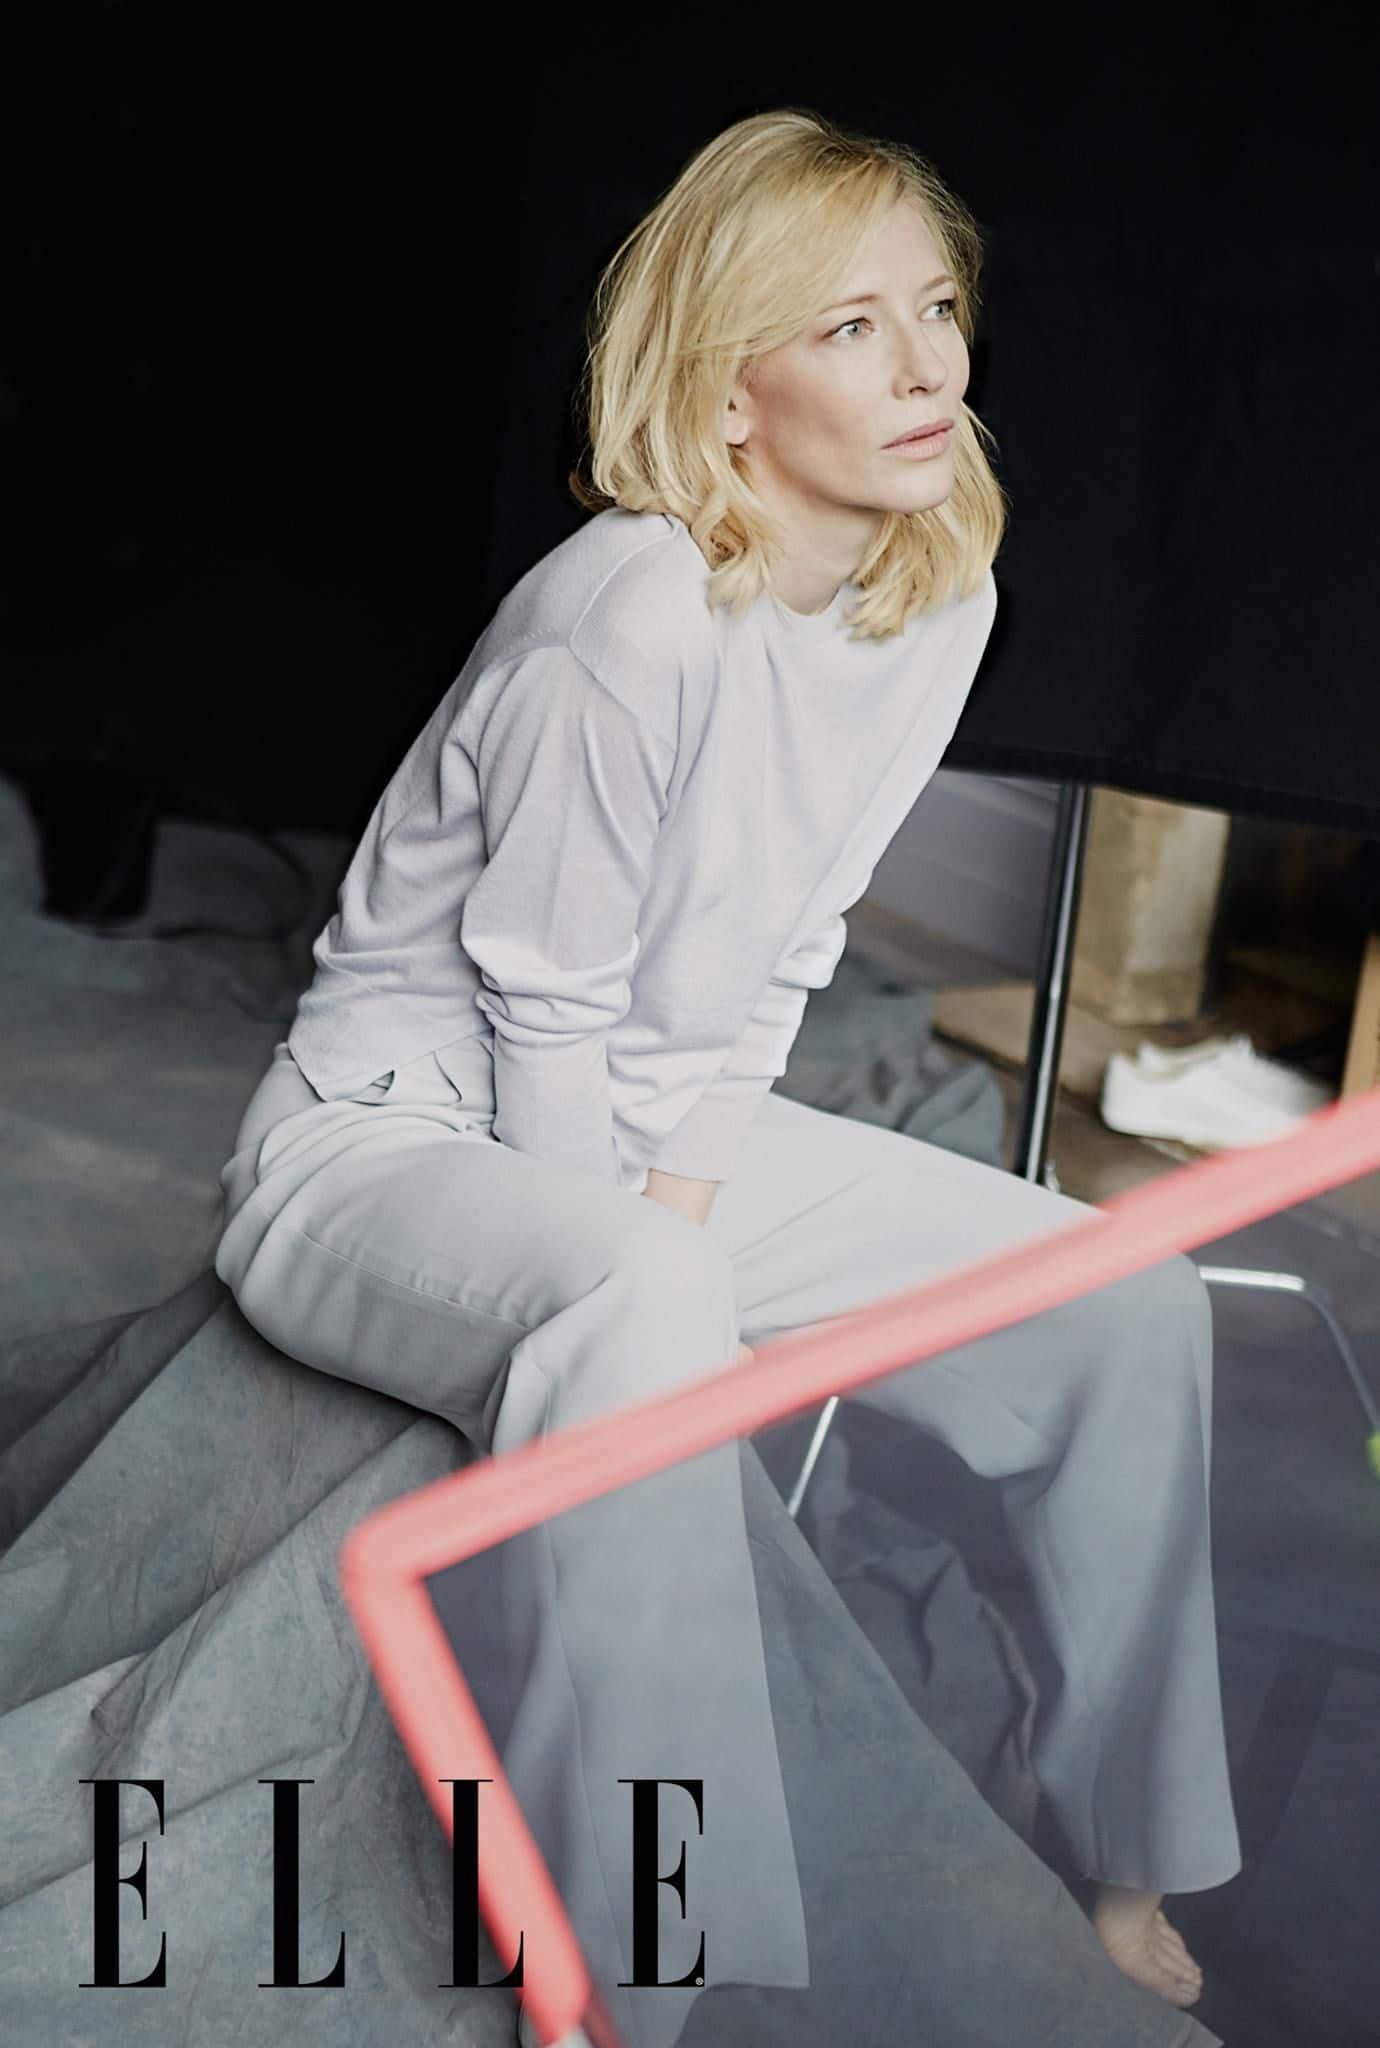 Cate Blanchett6, Hay una lesbiana en mi sopa